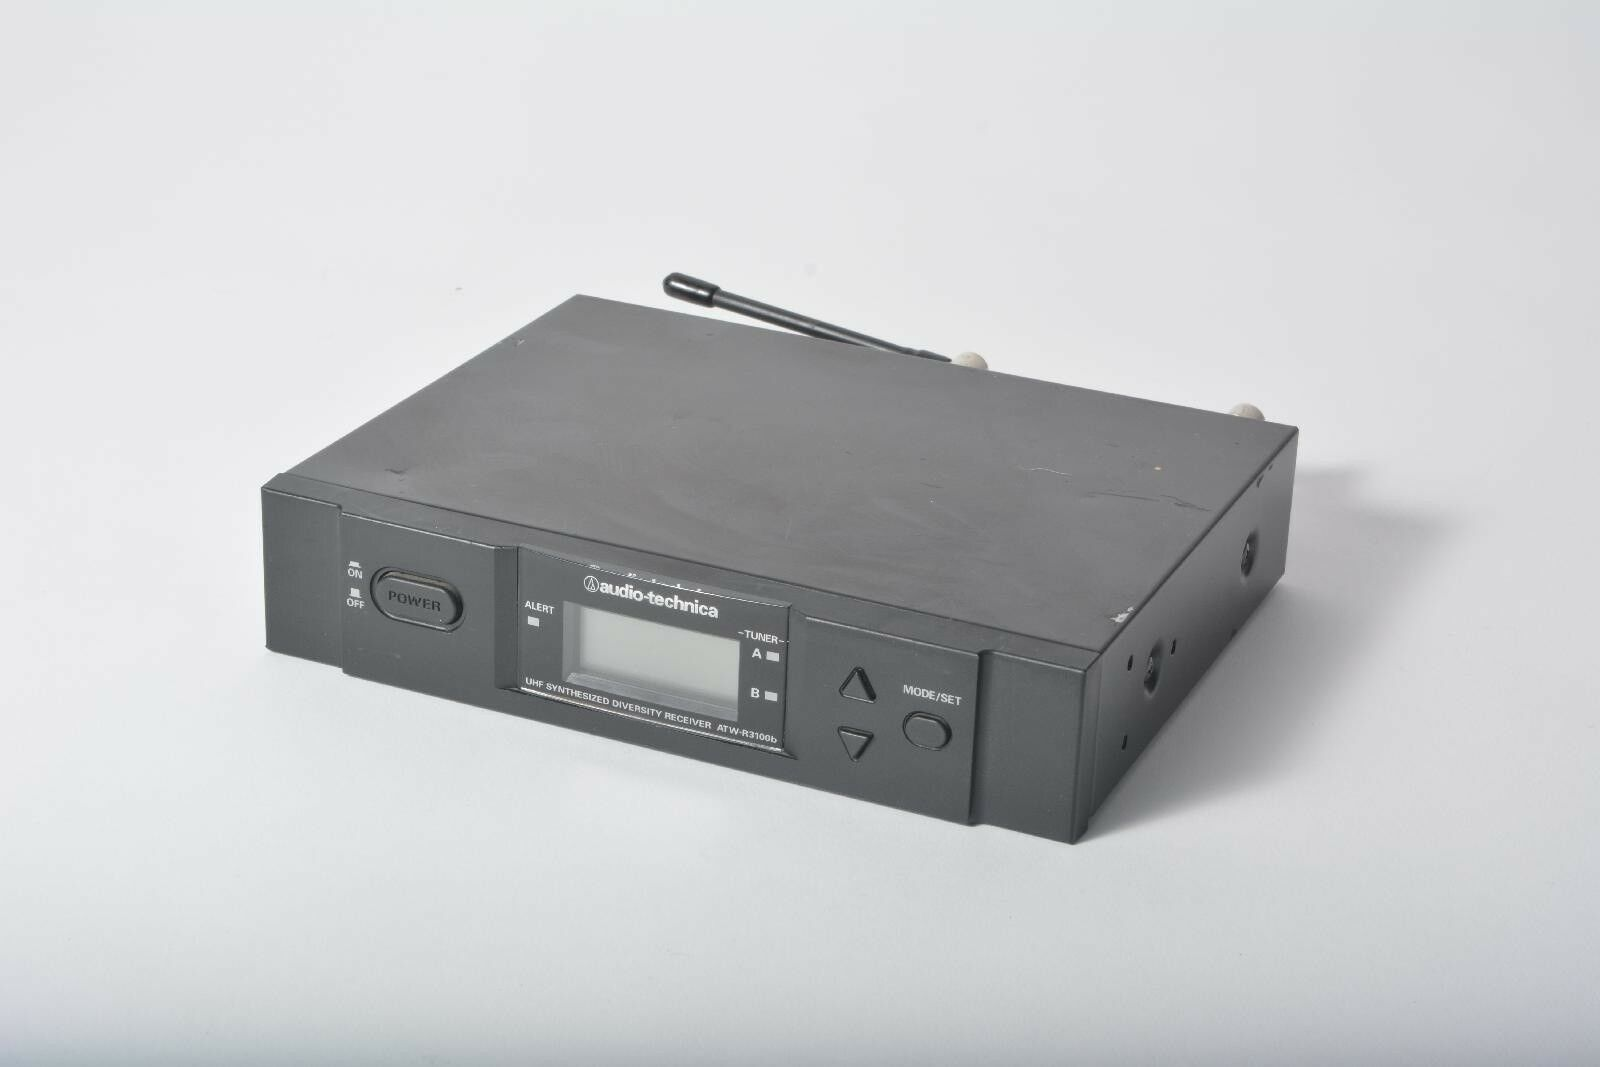 Audio-Technica ATW-R3100B UHF Synthesized Diversity Receiver Grade C